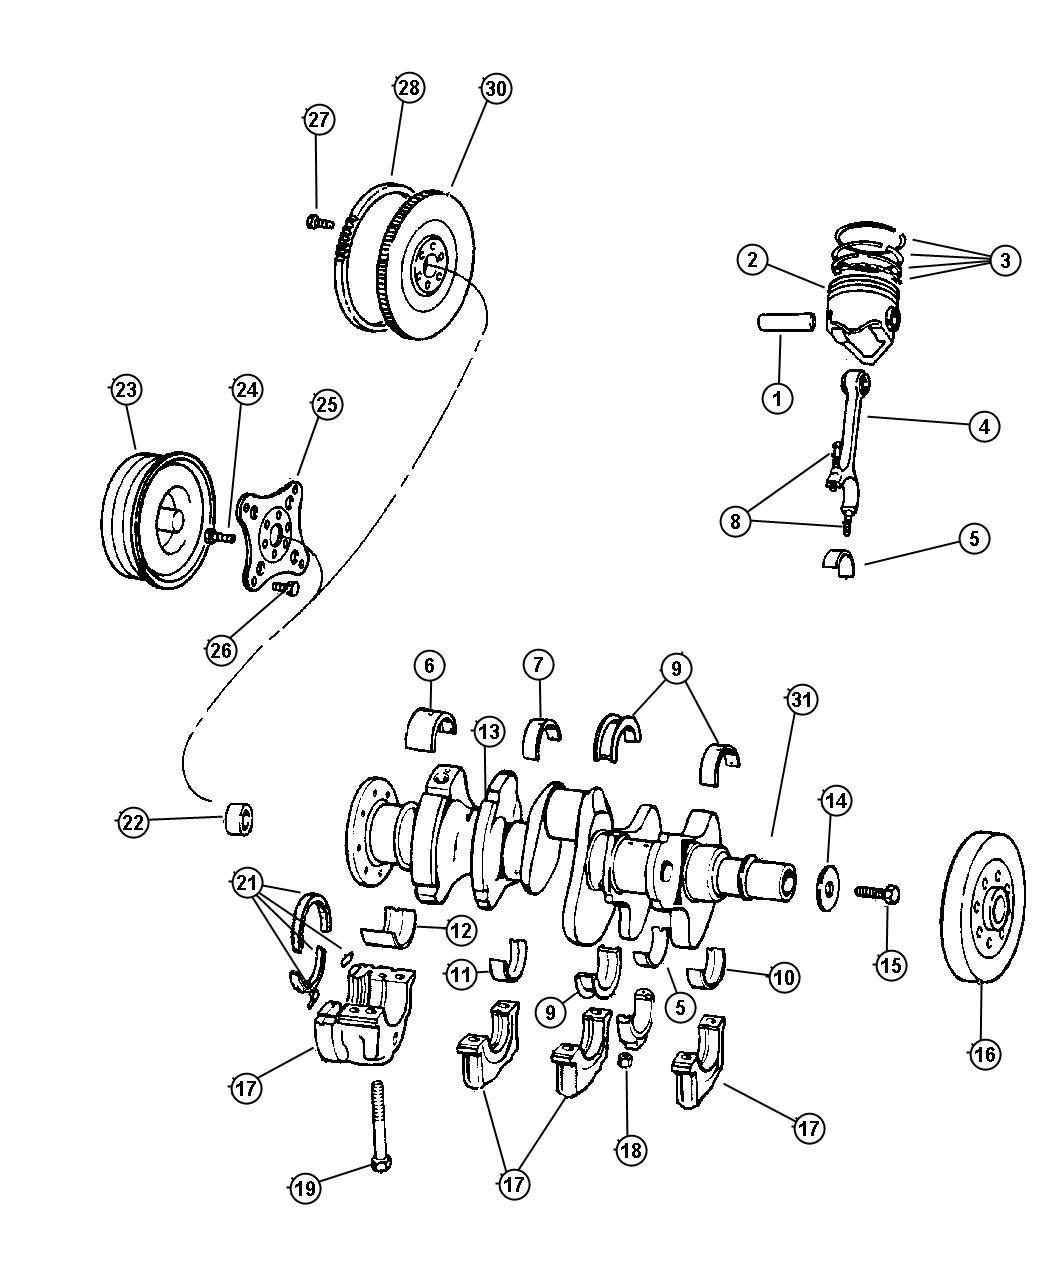 Dodge Dakota Magnum 3 9l Smpi V6 4 Spd Automatic